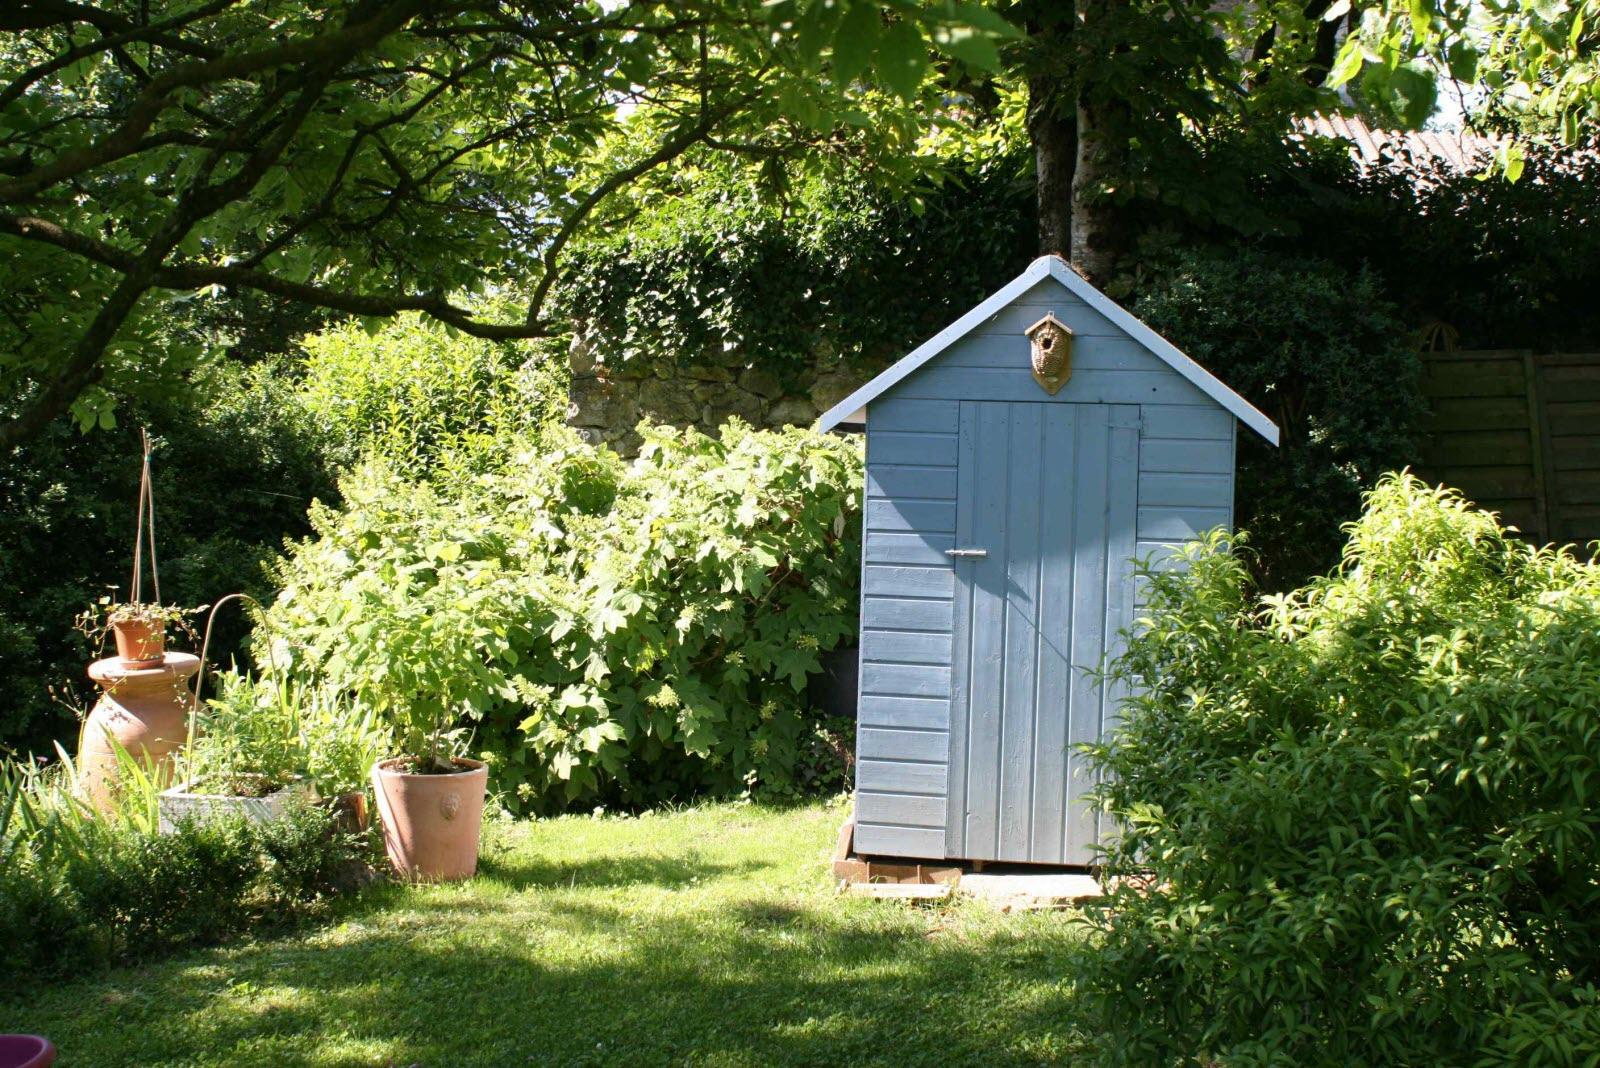 Magazine Immobilier | Construire Un Abri De Jardin : Quelles ... avec Construire Une Cabane De Jardin